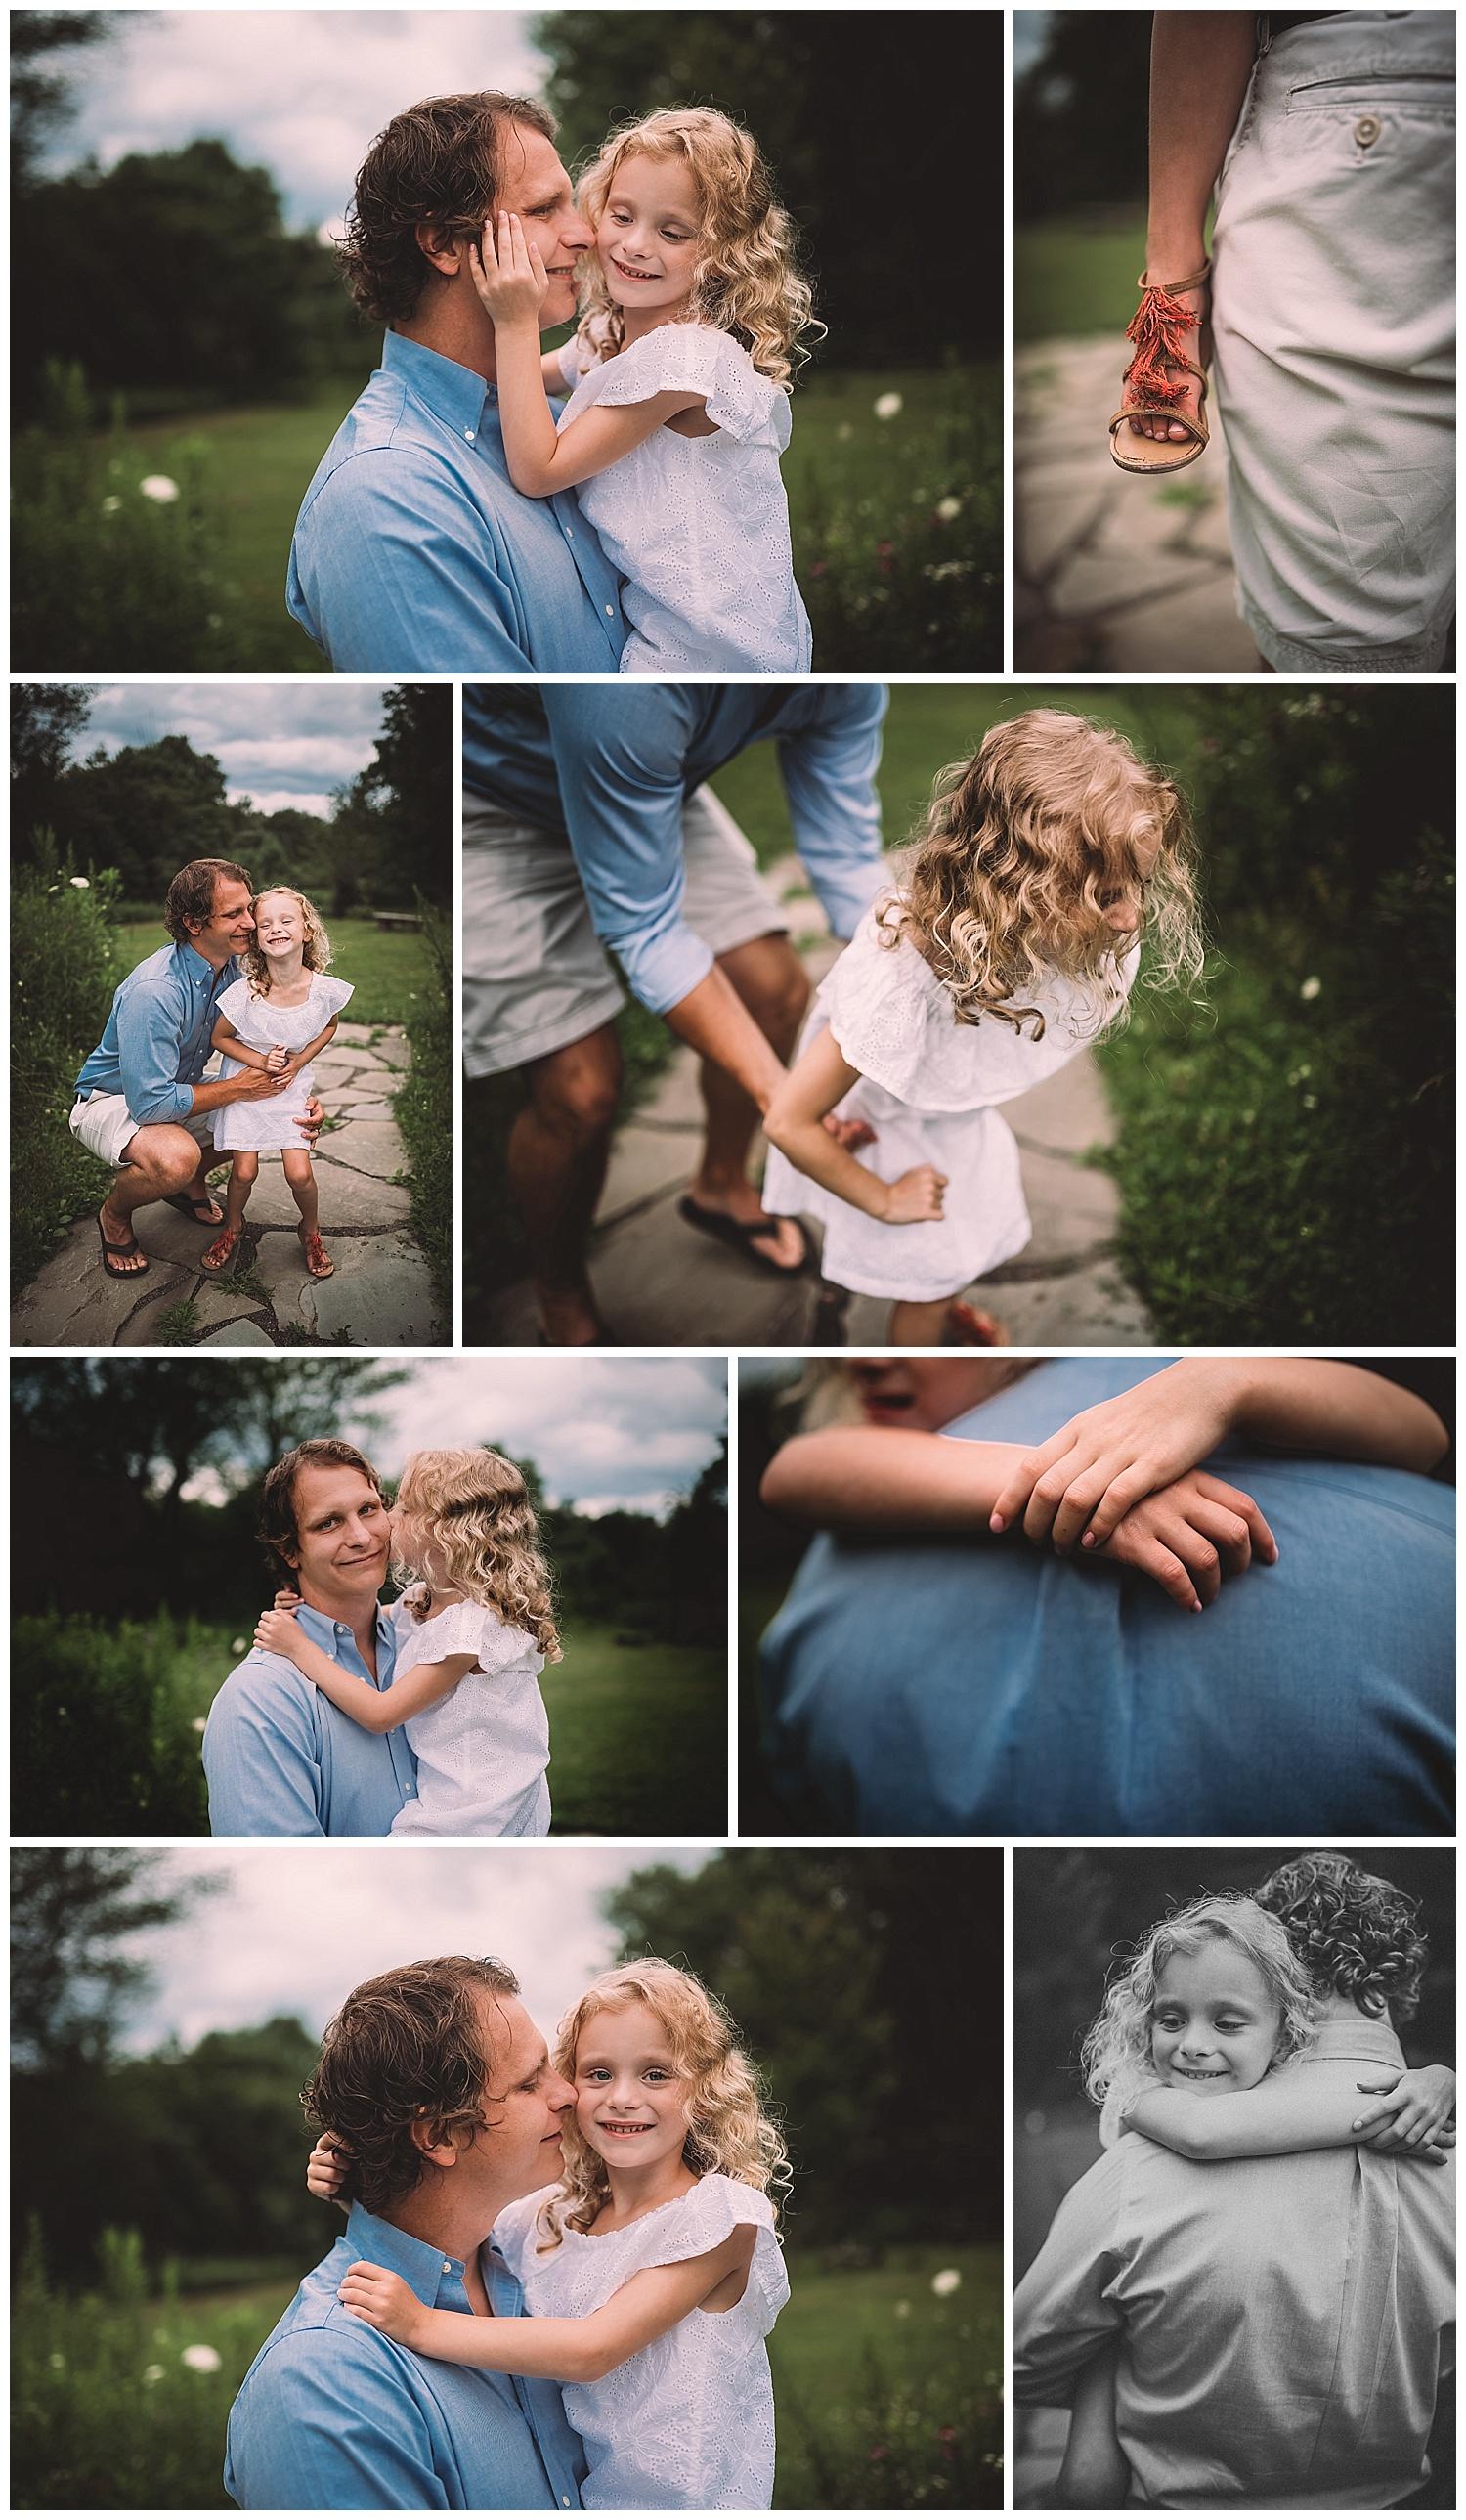 NEPA Family Photographer in Bloomsburg, Pennsylvania at Nescopeck State Park